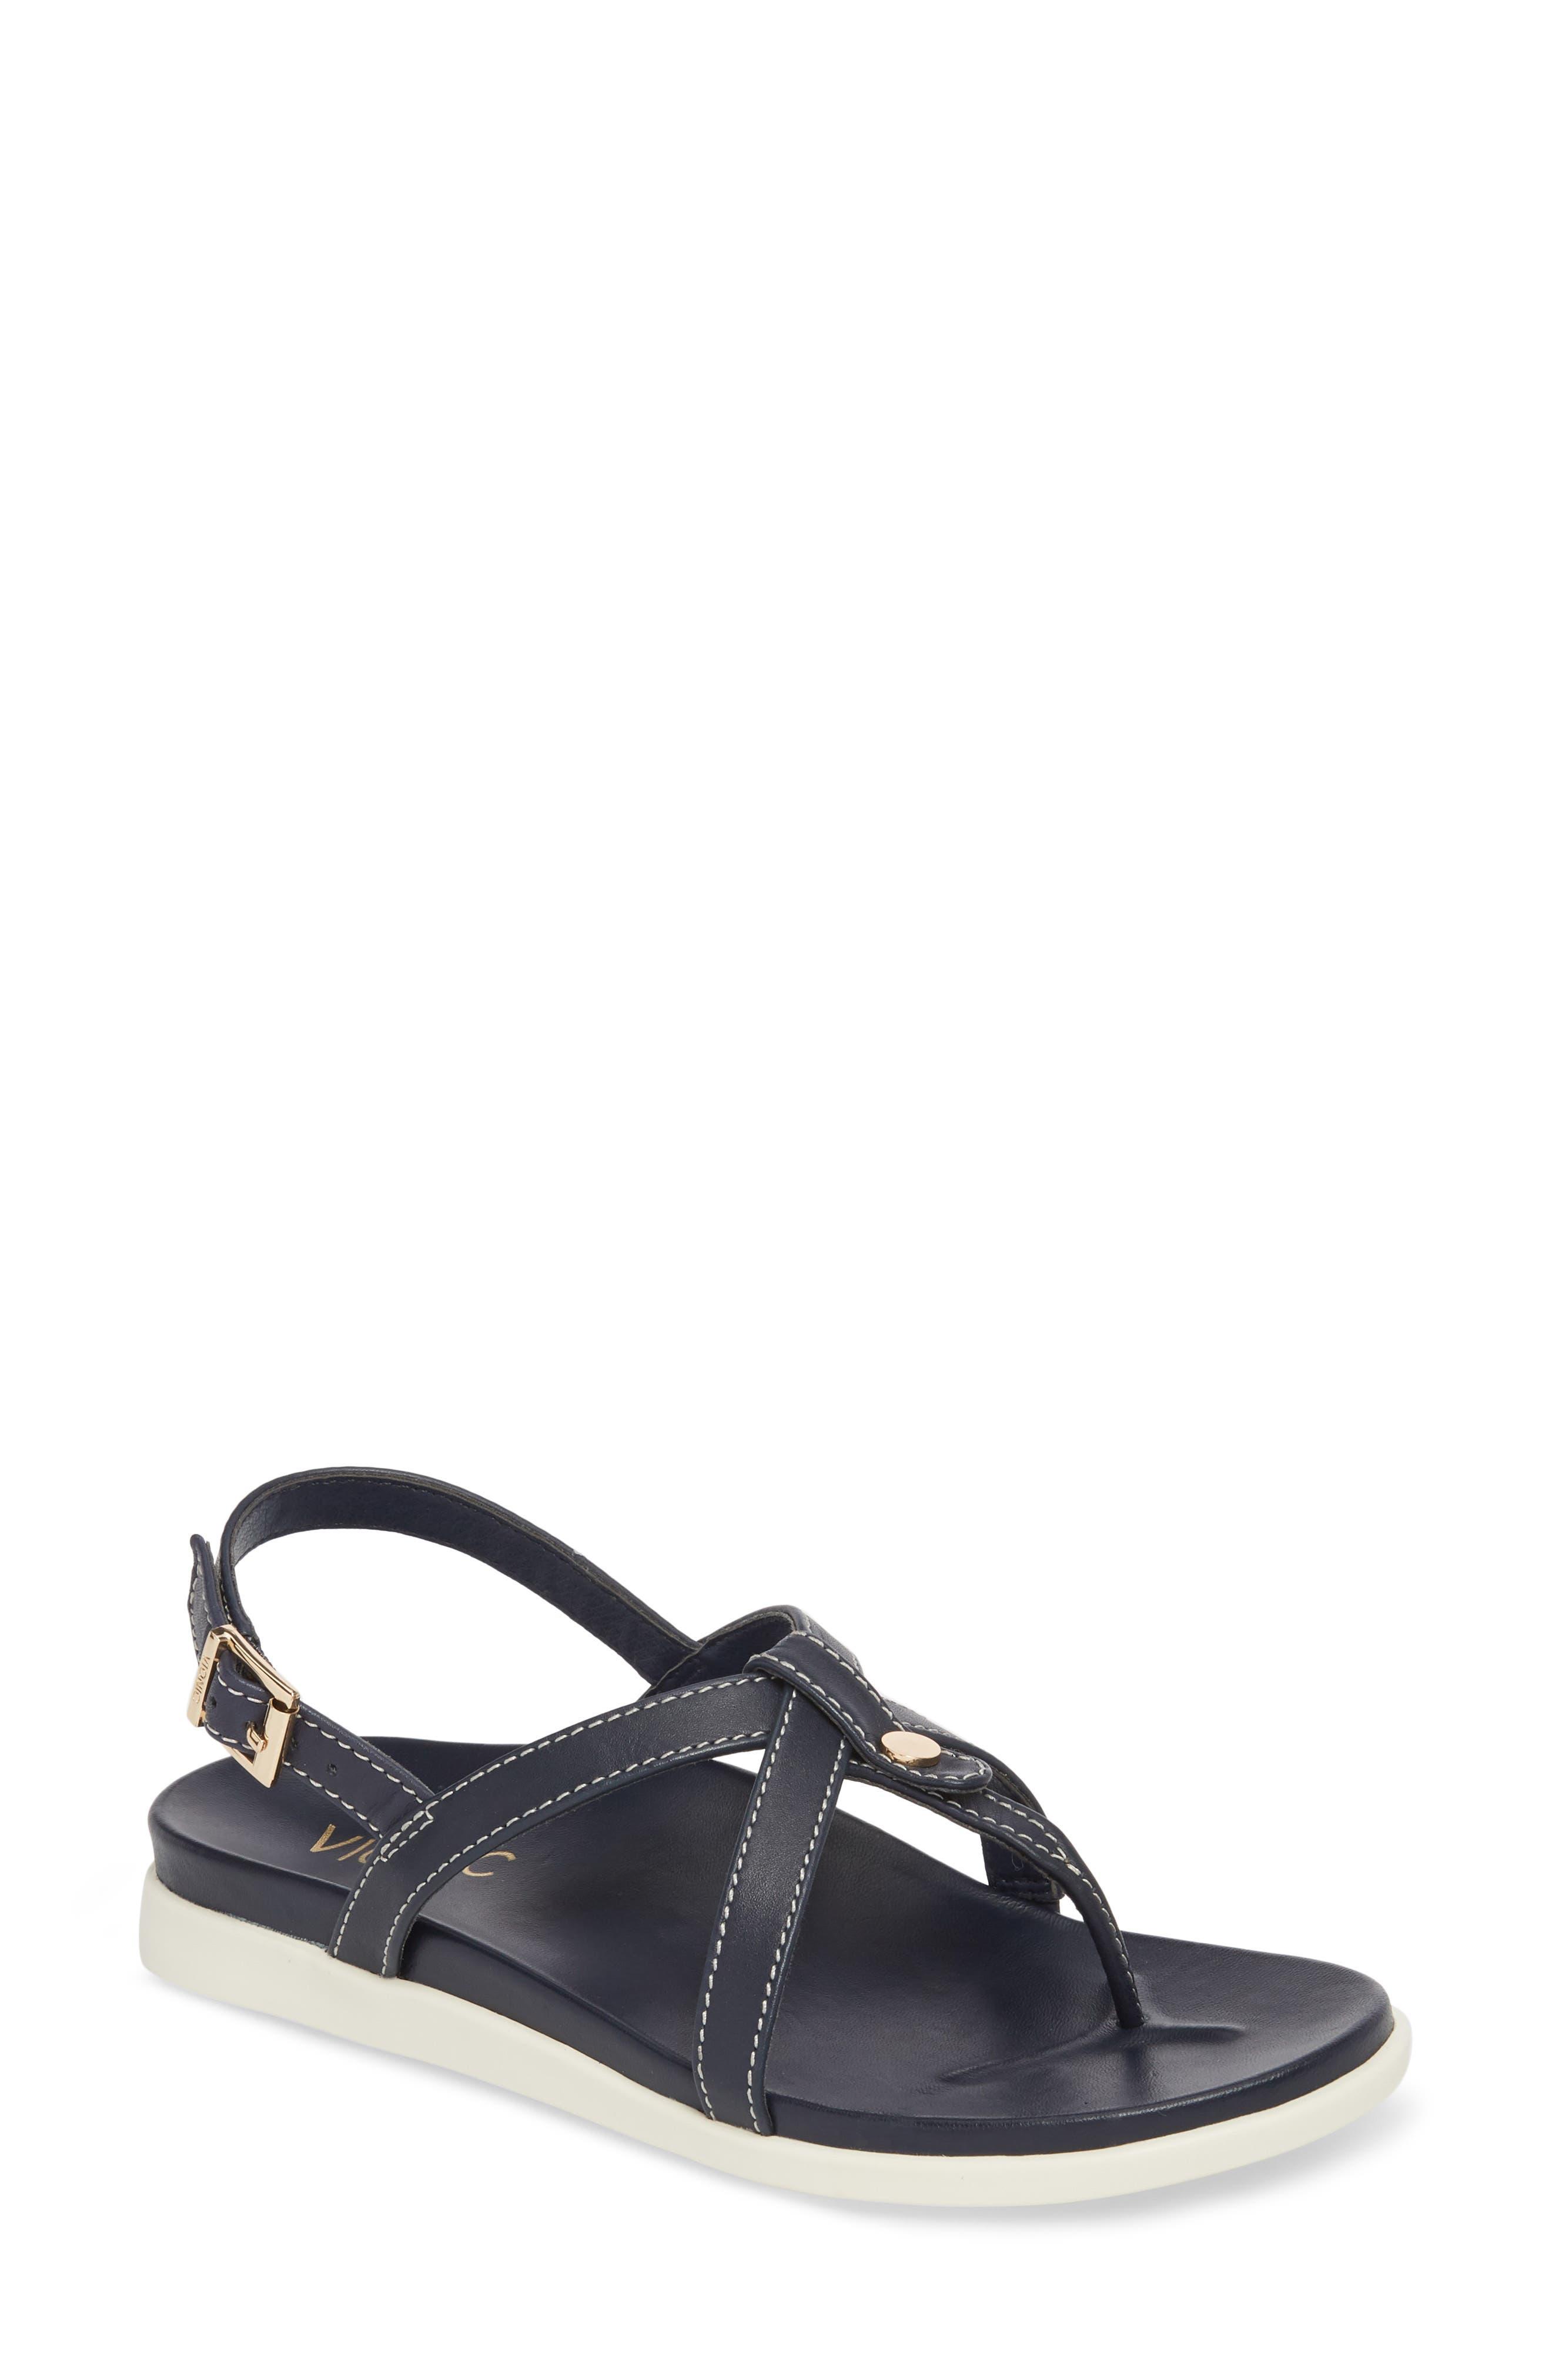 Veranda Orthaheel<sup>®</sup> Sandal,                             Main thumbnail 1, color,                             Navy Leather